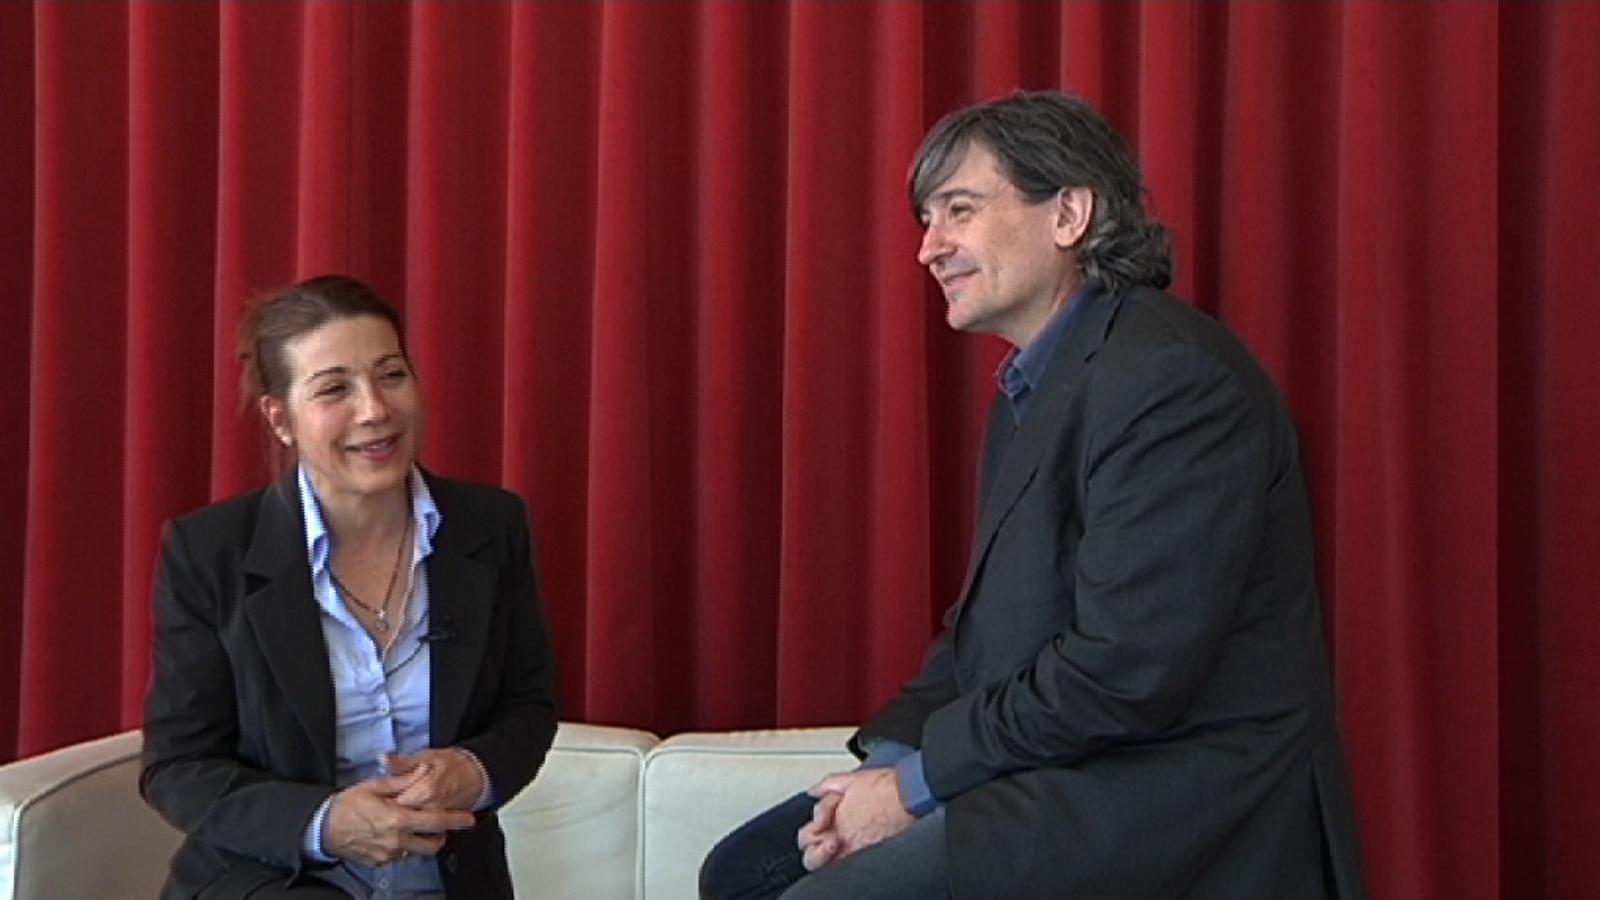 Entrevista completa a Emma Vilarasau